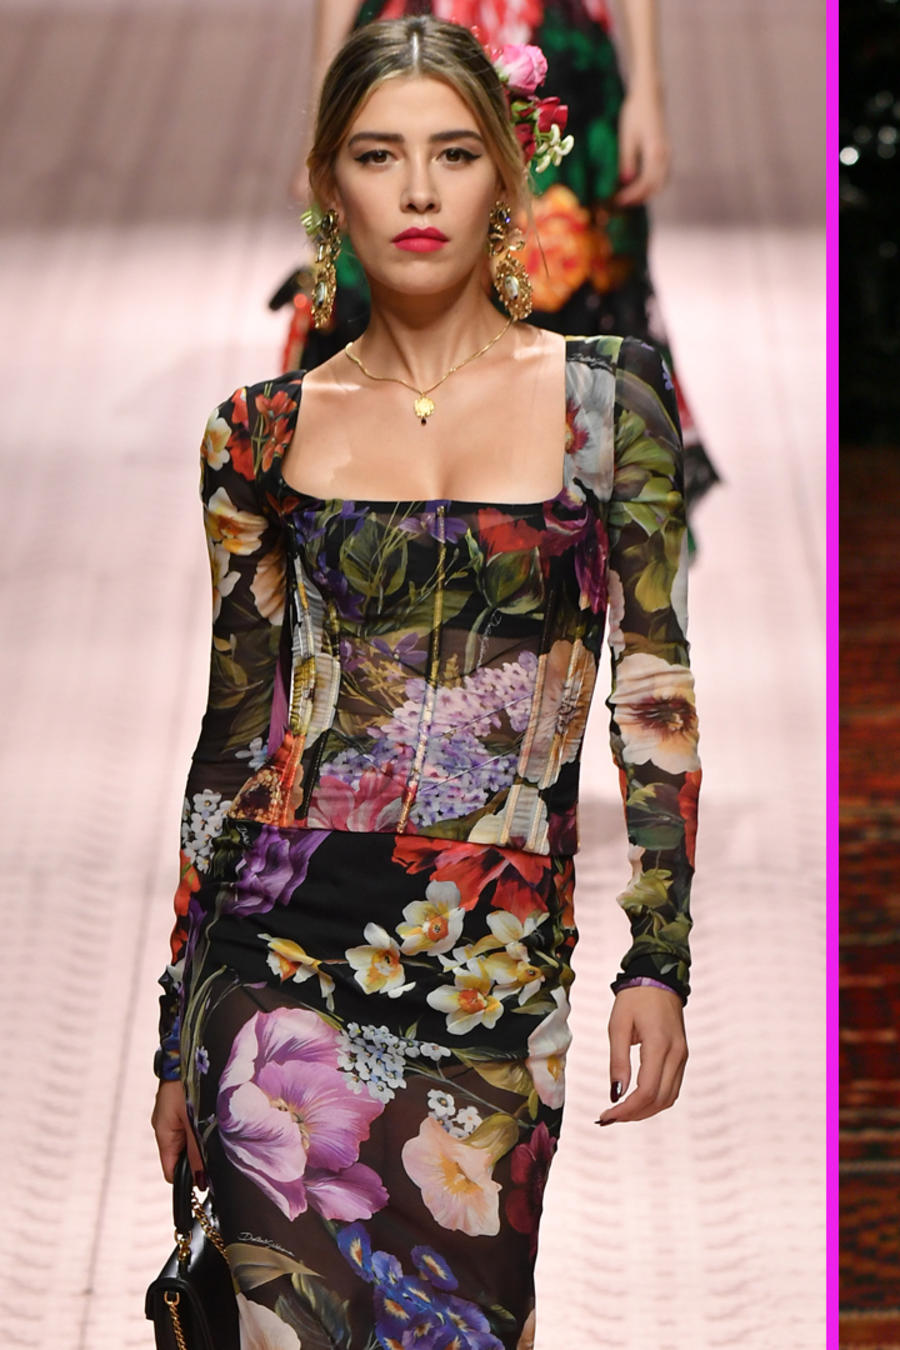 Michelle Salas fanática de la moda.